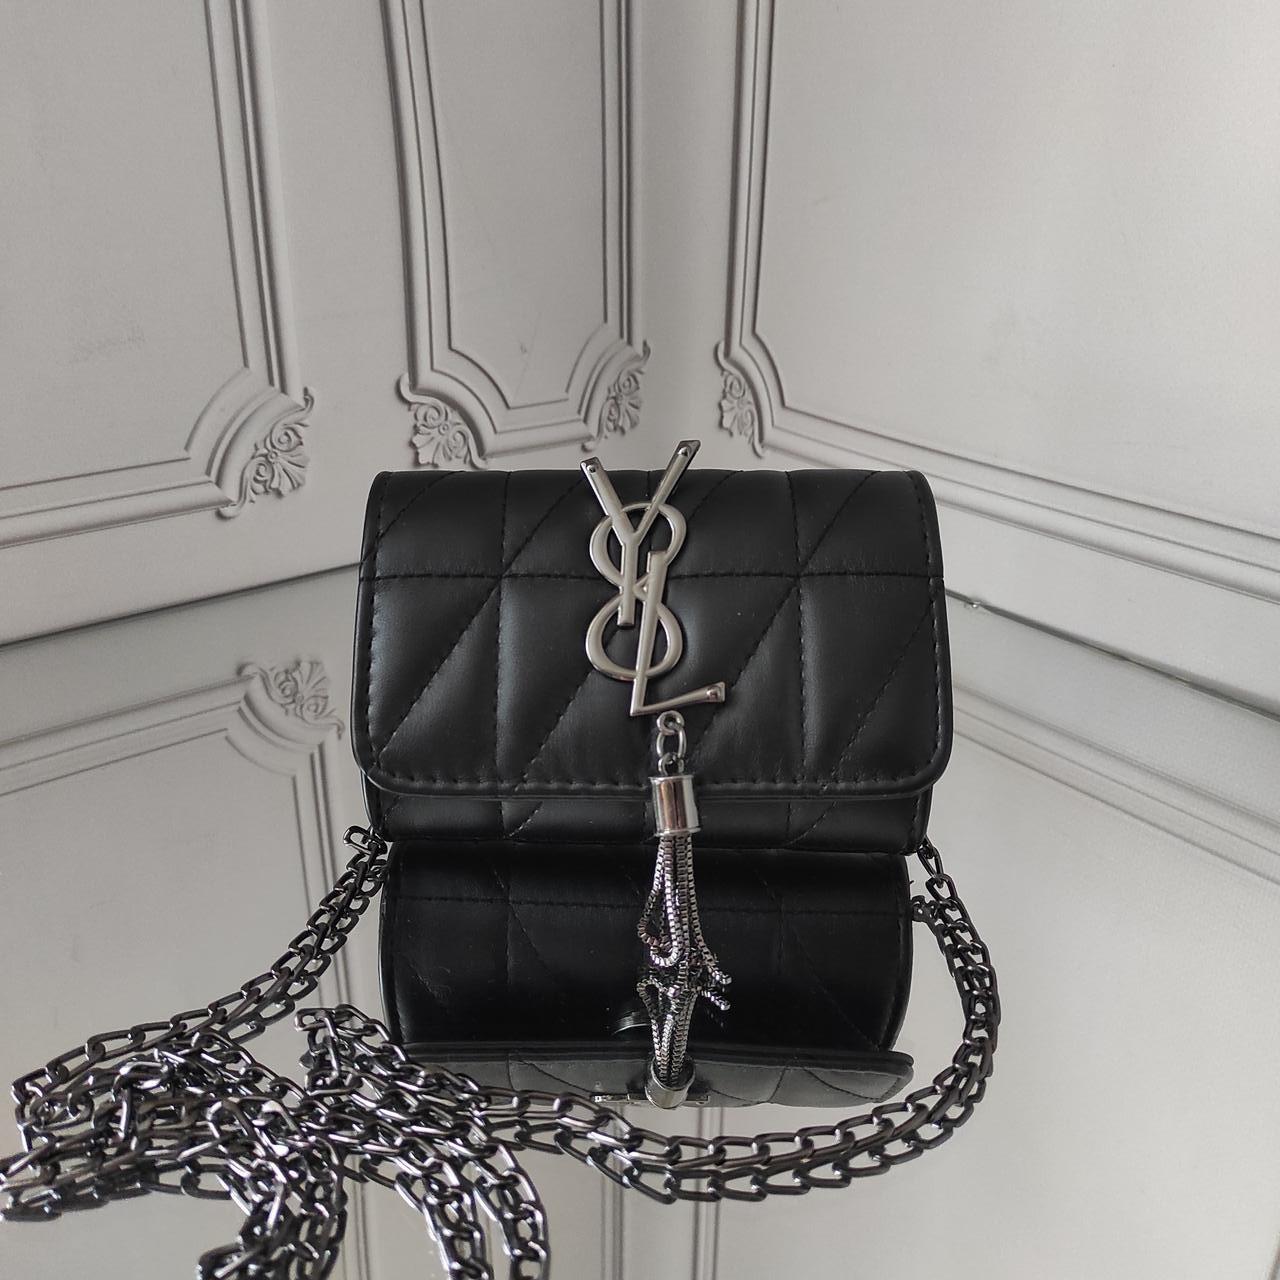 Сумочка для девочки, мини кросс боди, Yves Saint Laurent